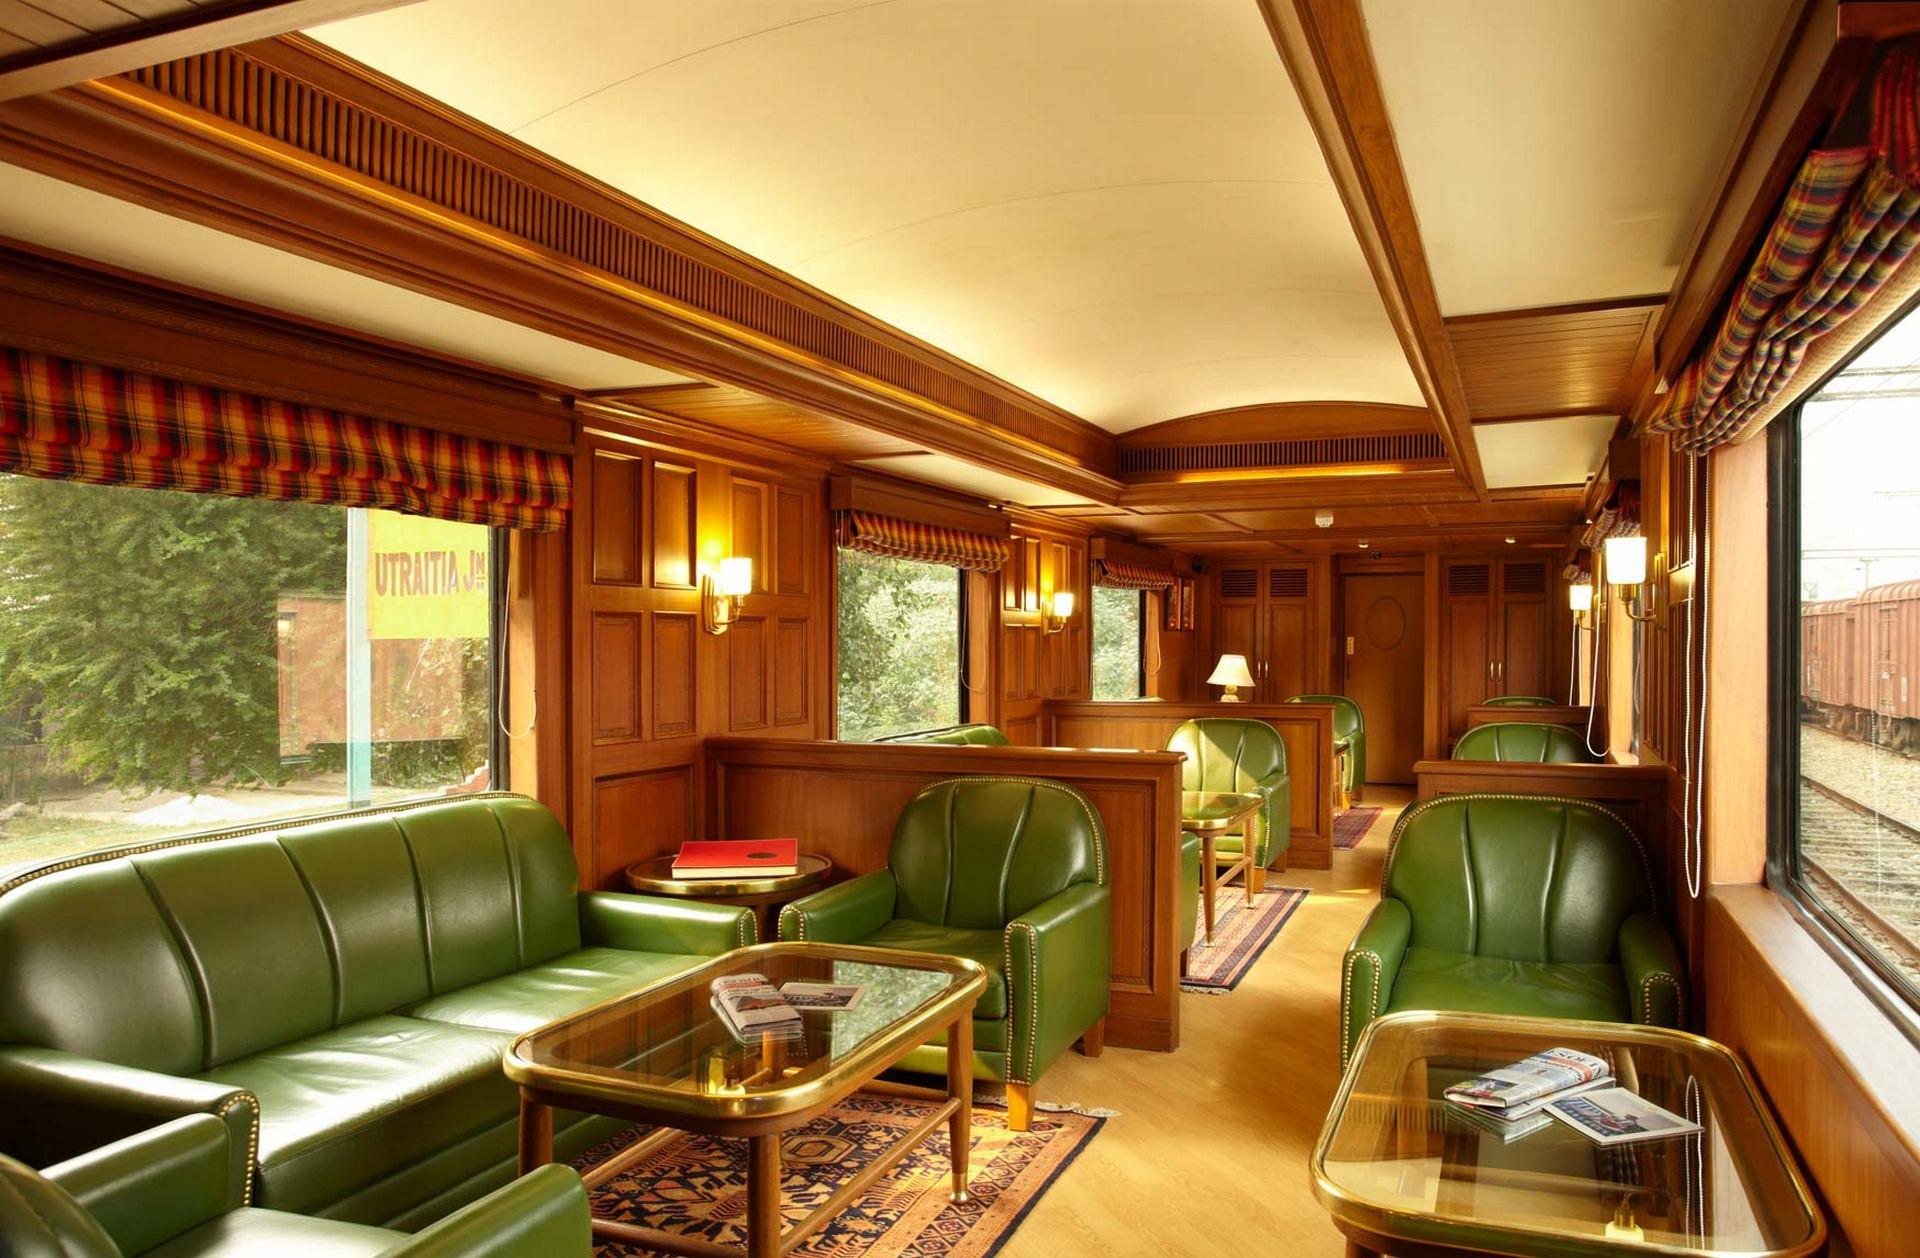 NOMAD-luksusowe-pociągi-Golden-Chariot-Indie-03-1